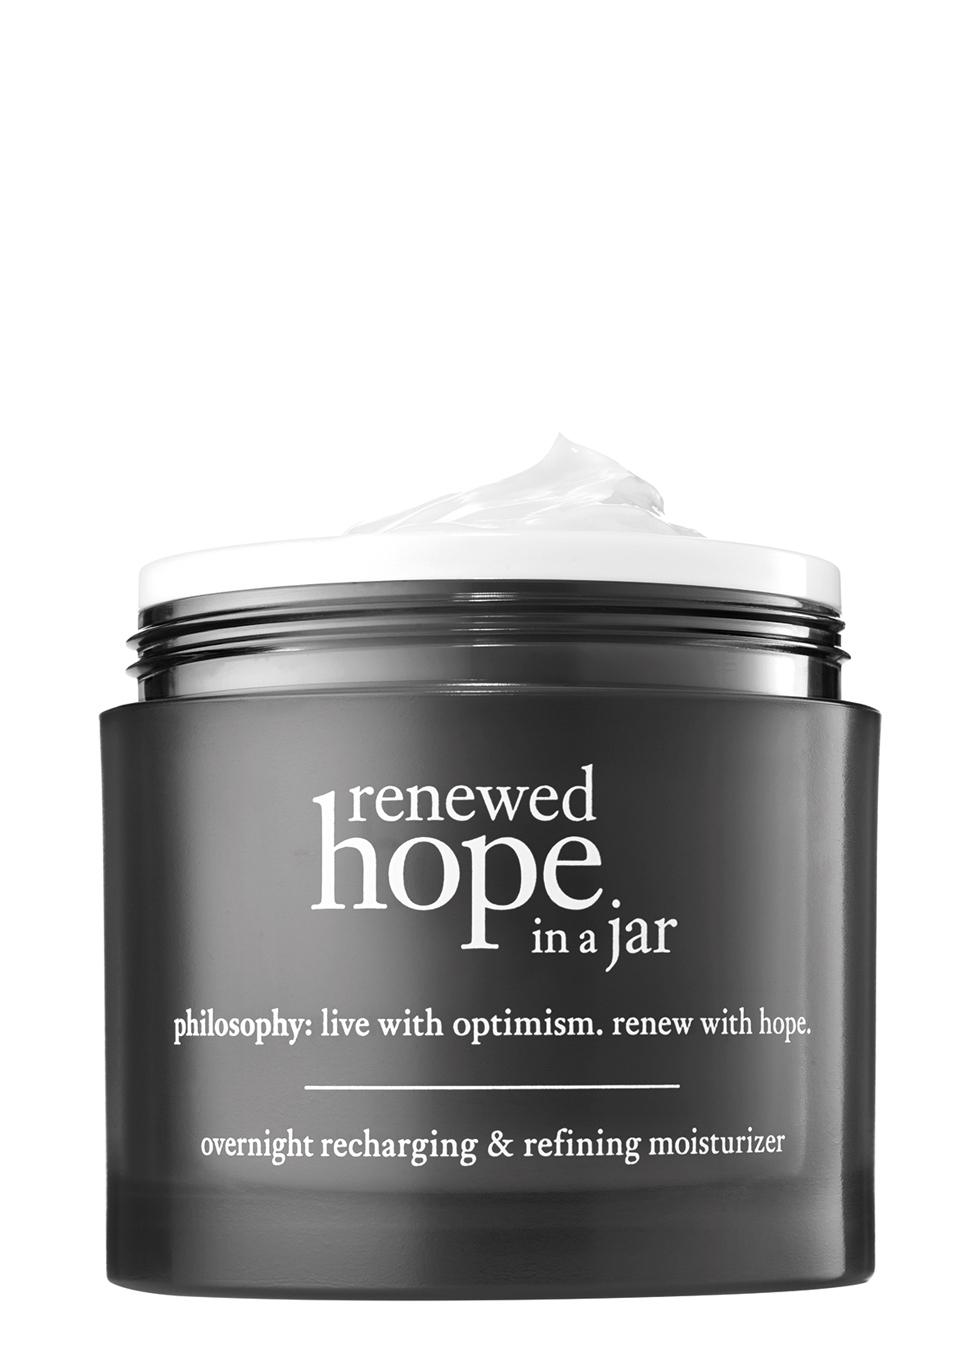 Renewed Hope In A Jar Overnight Moisturizer 60ml - PHILOSOPHY